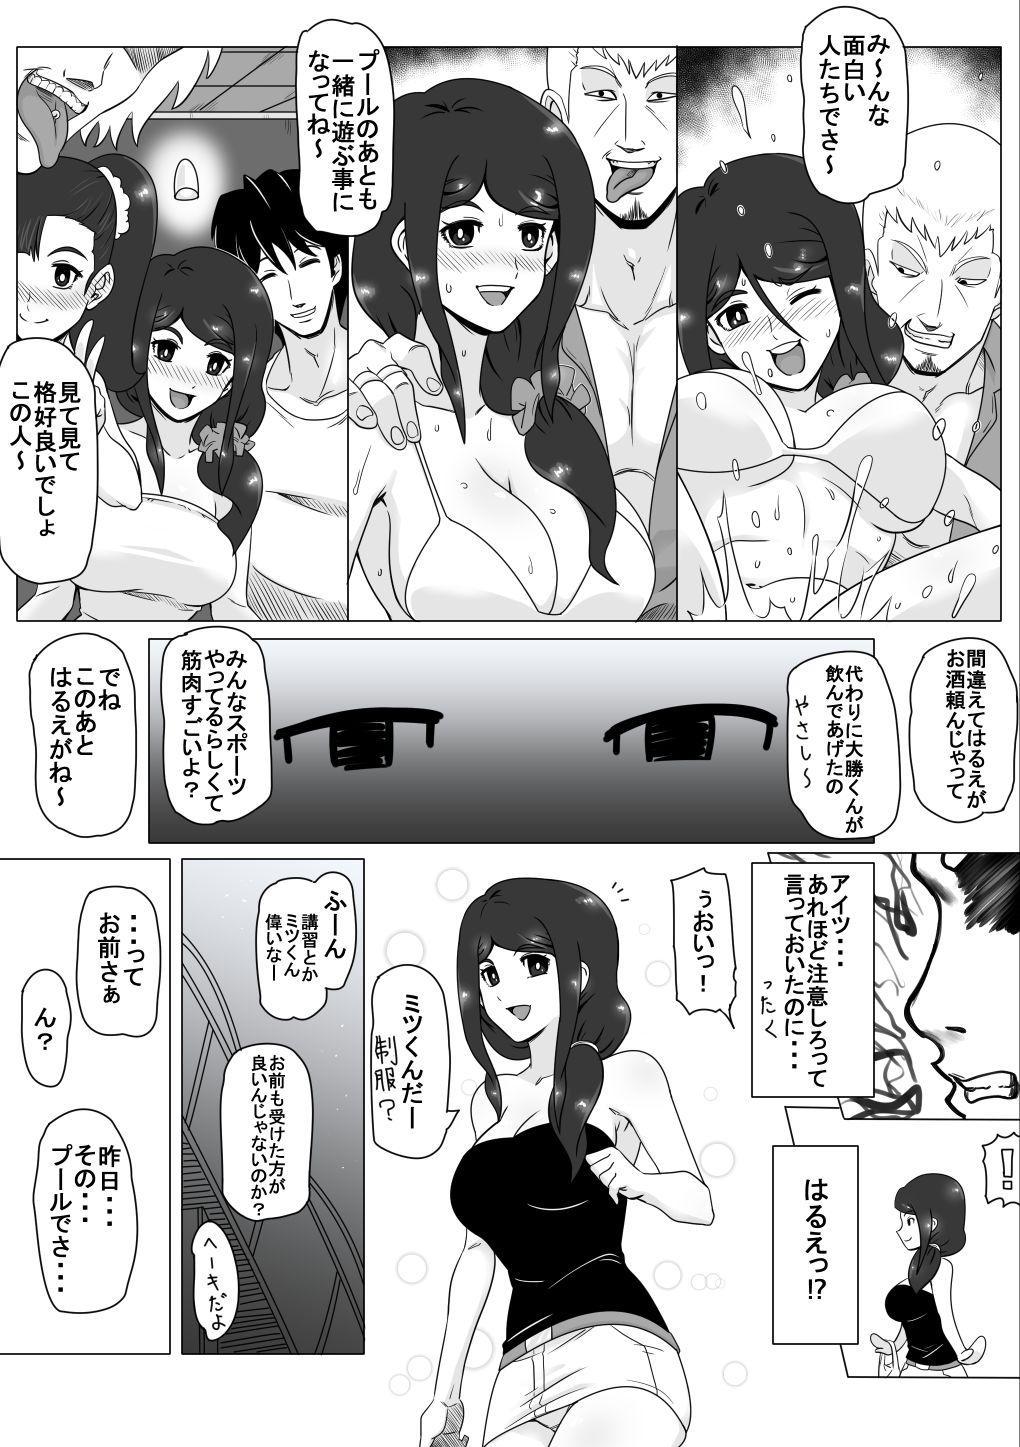 Osananajimi no Natsuyasumi 10